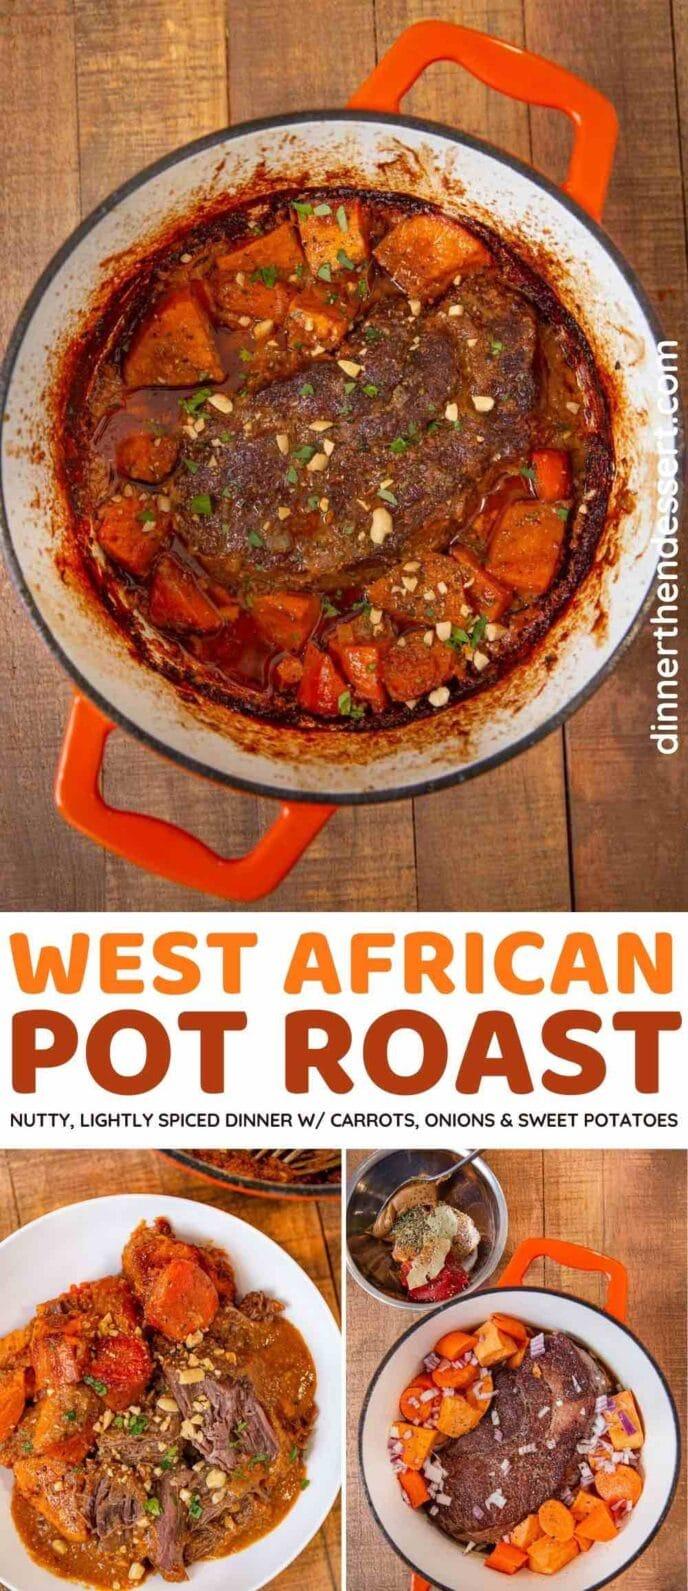 West African Pot Roast